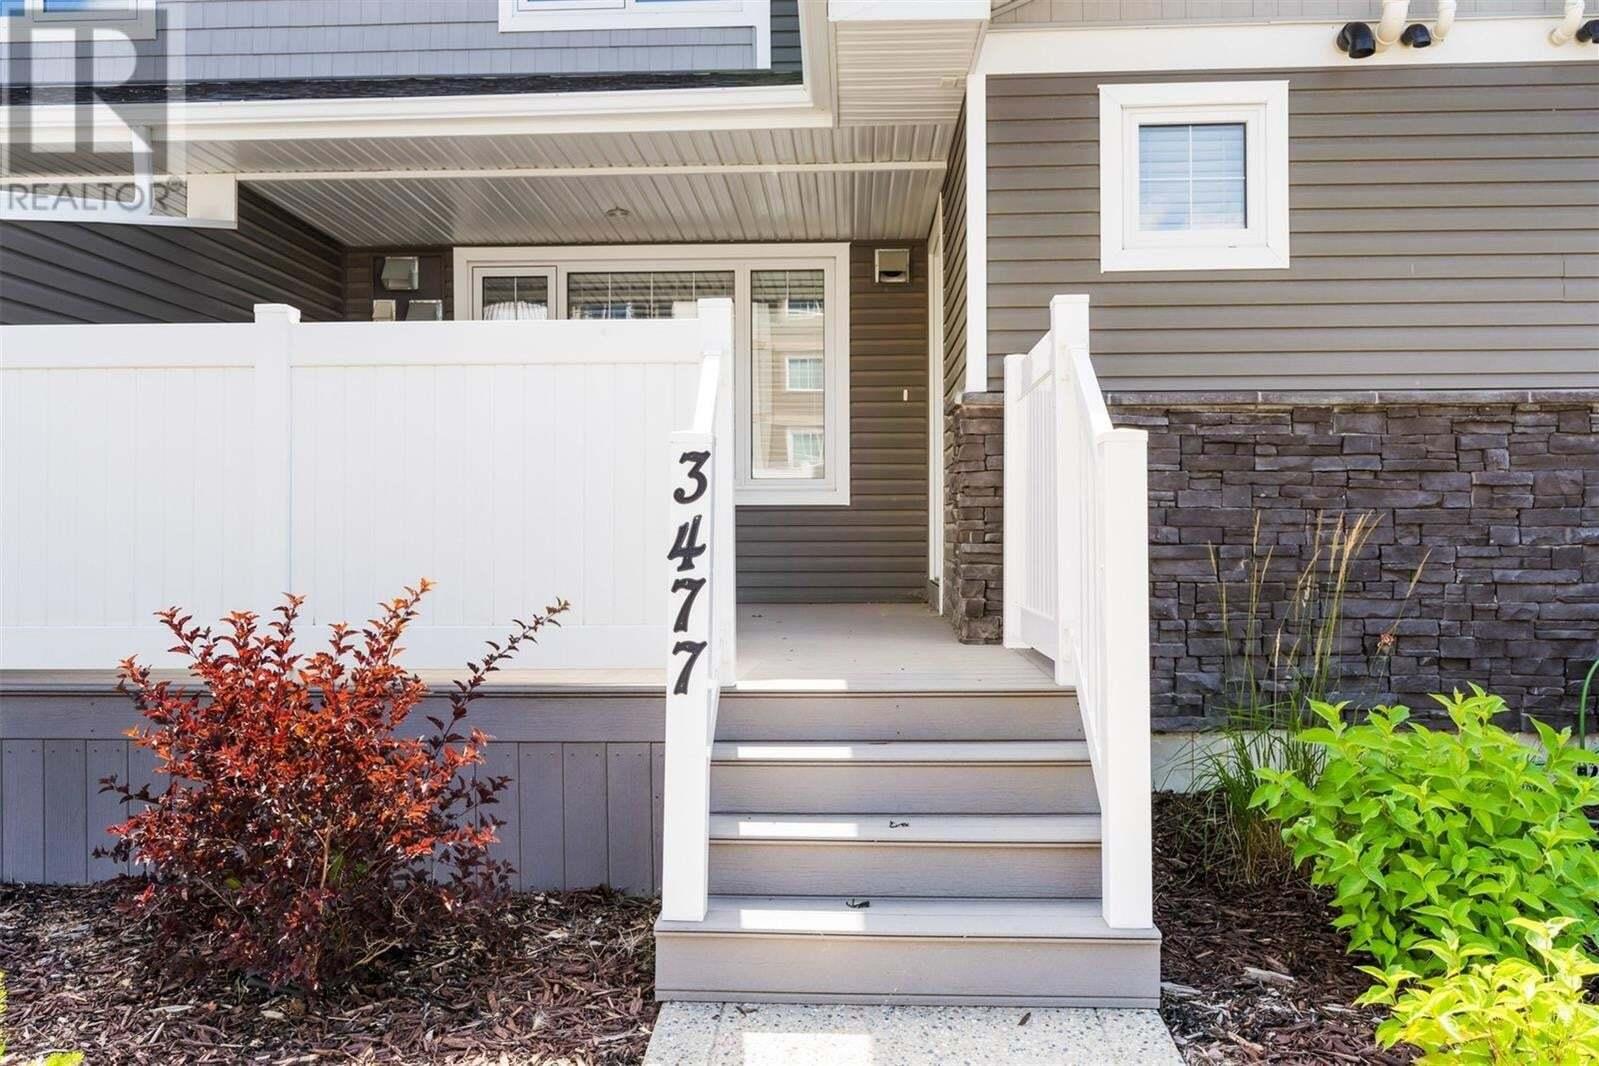 Townhouse for sale at 3477 Elgaard Dr Regina Saskatchewan - MLS: SK821527